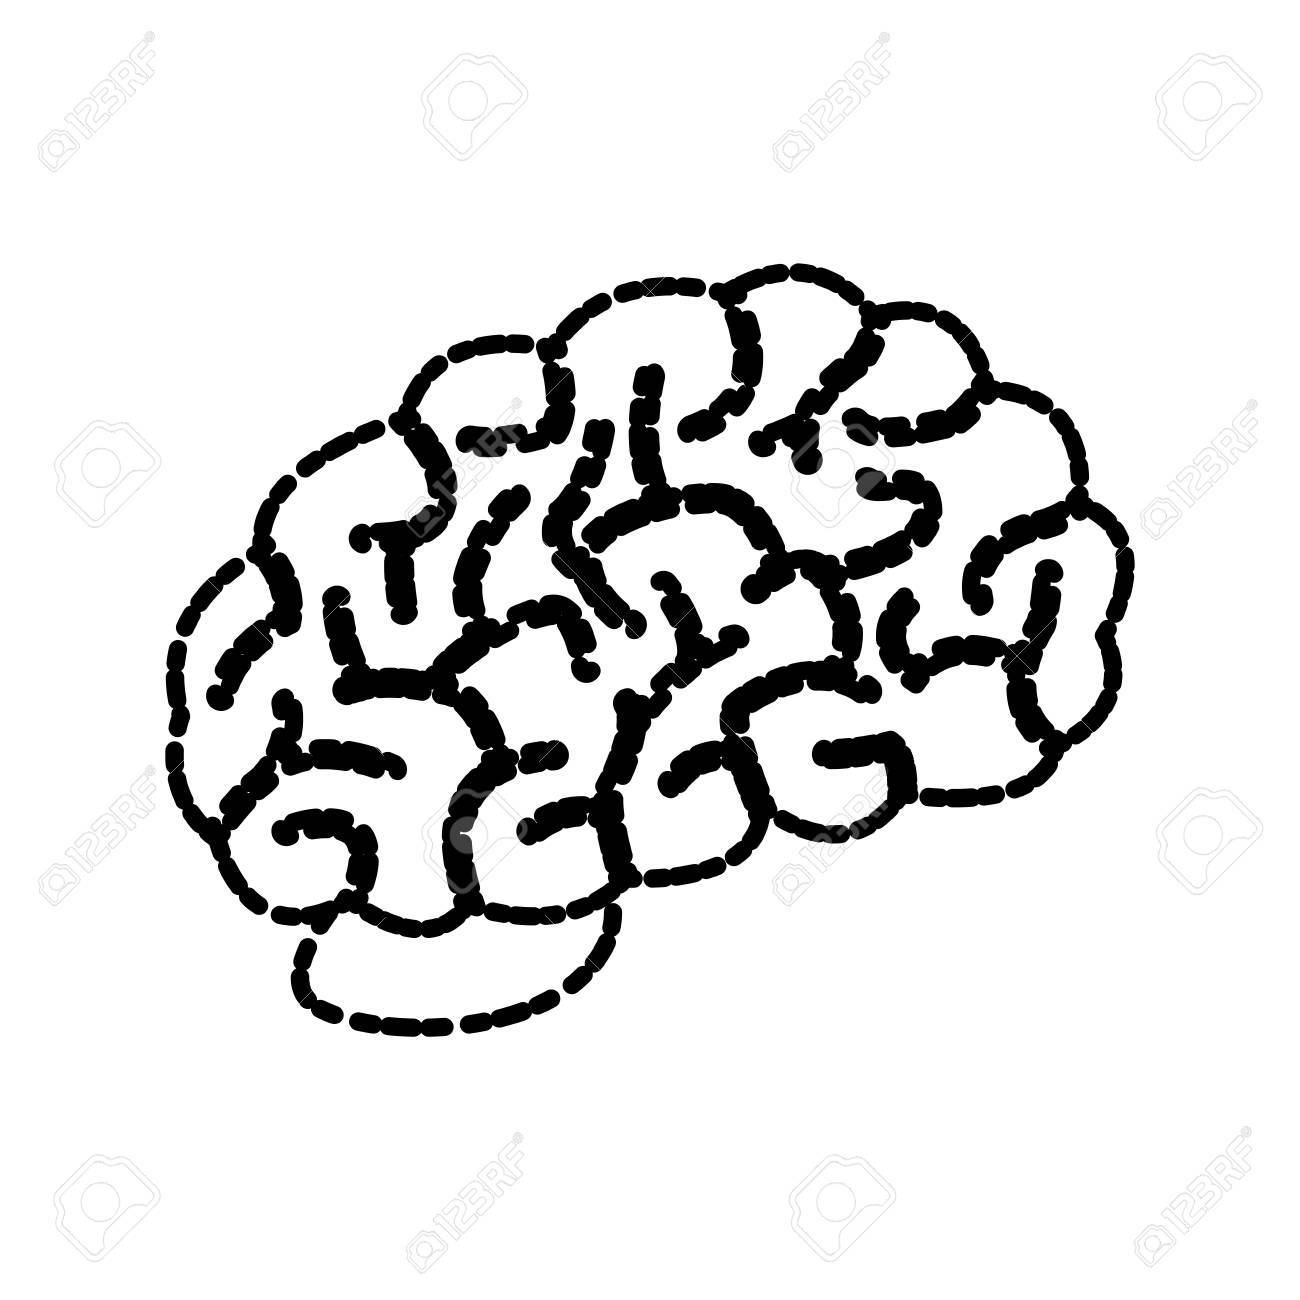 Human brain symbol icon vector illustration graphic design royalty human brain symbol icon vector illustration graphic design stock vector 88790987 biocorpaavc Images